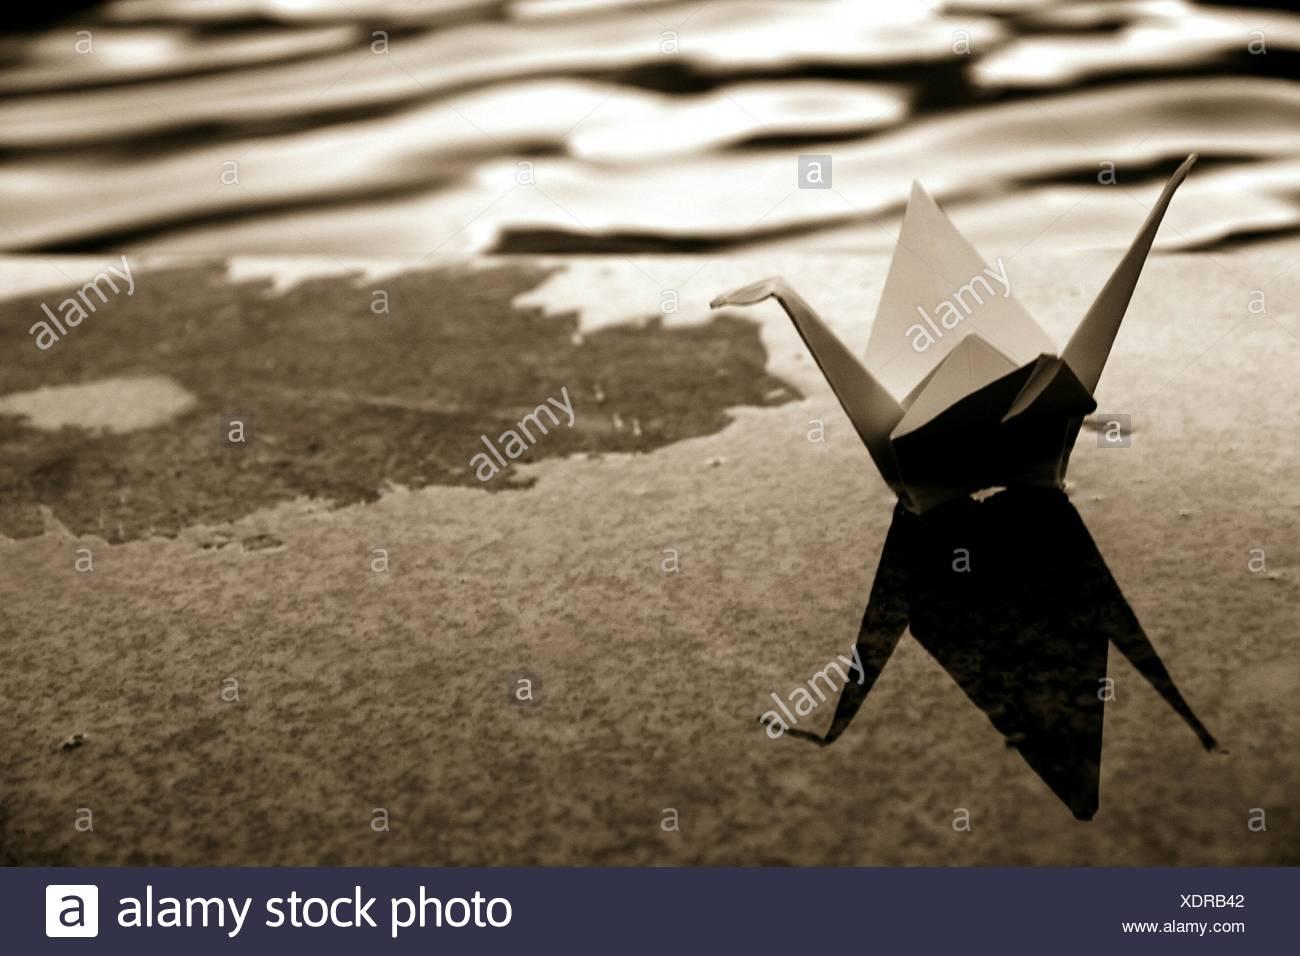 Papierkranich auf Sims durch Fluss Stockbild